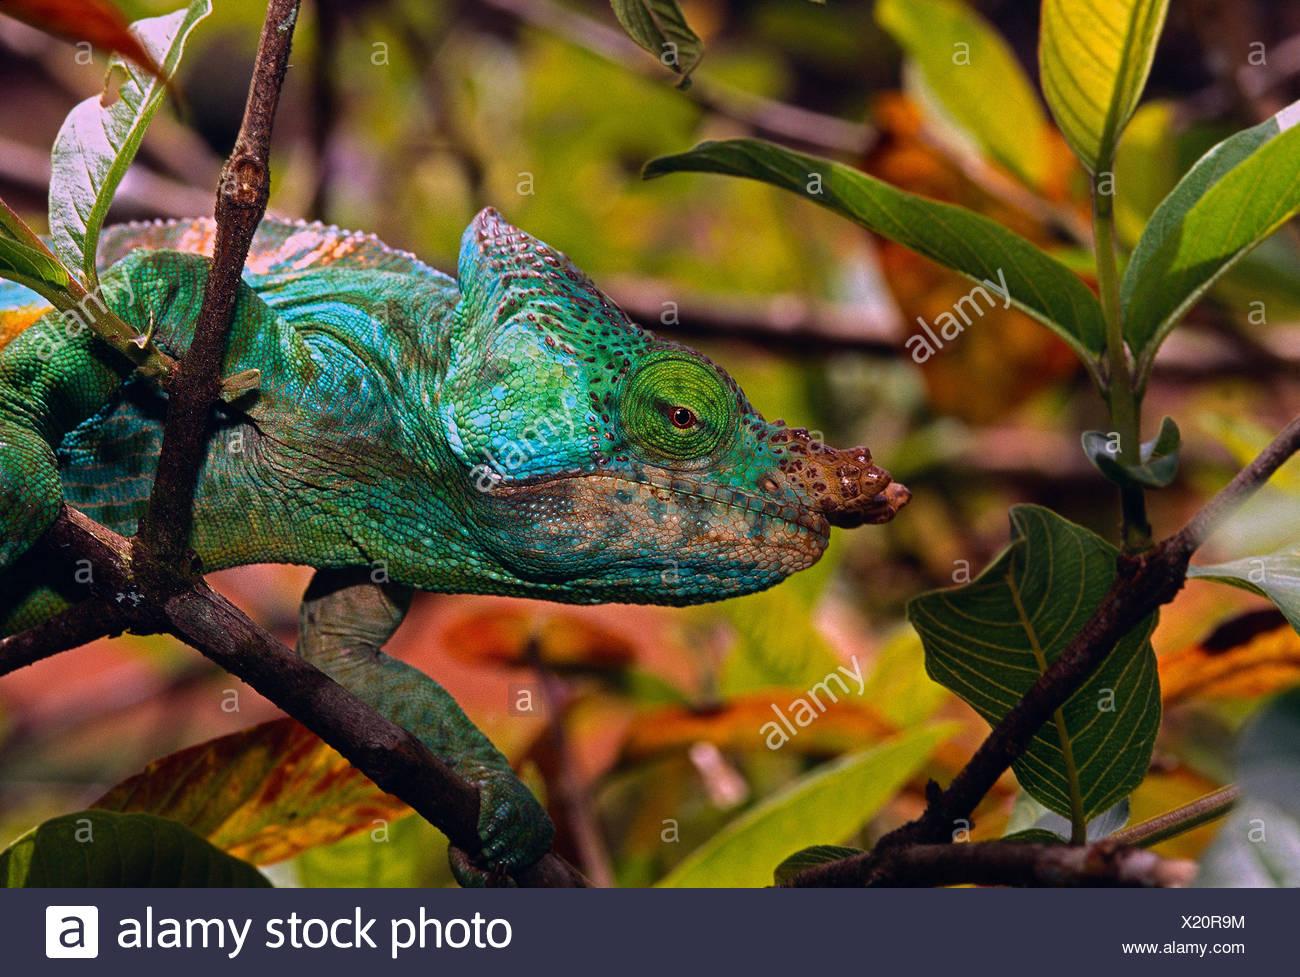 Madagascar. Wildlife. camaleón. Imagen De Stock